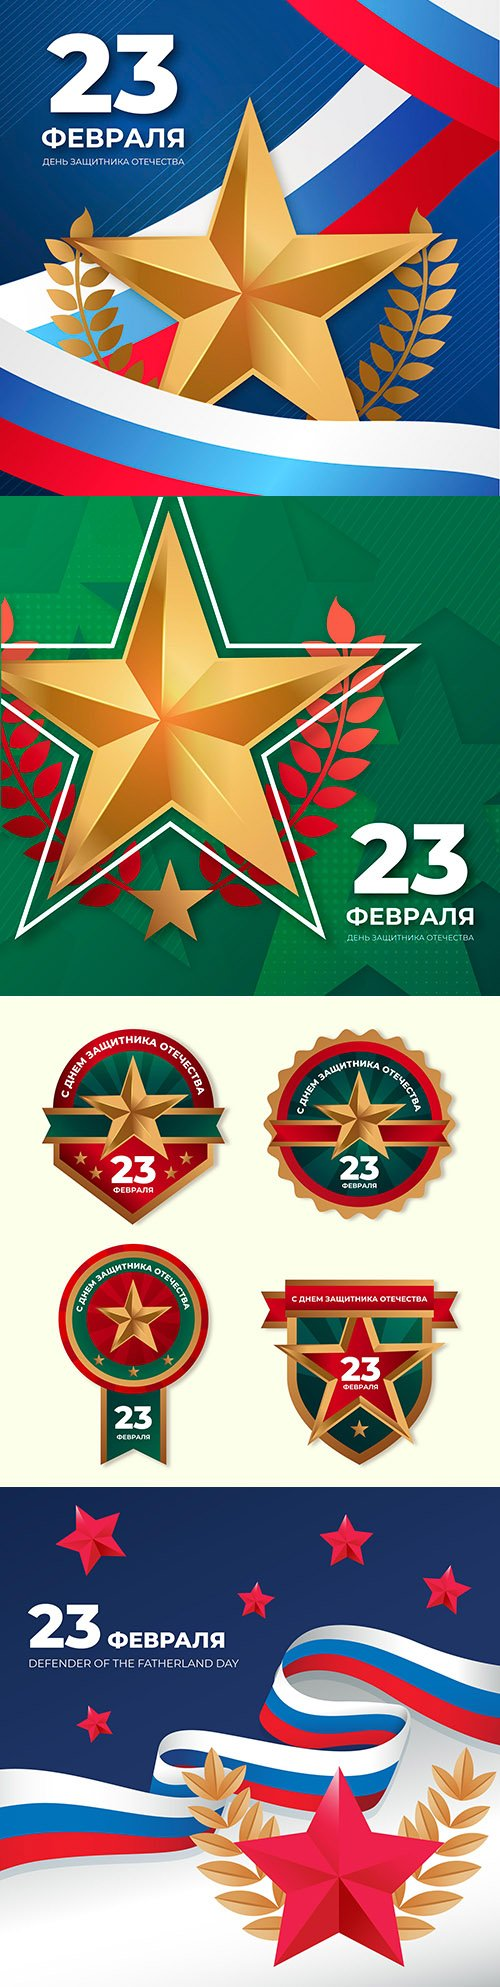 February 23 Defender of Fatherland day illustration flat design 2